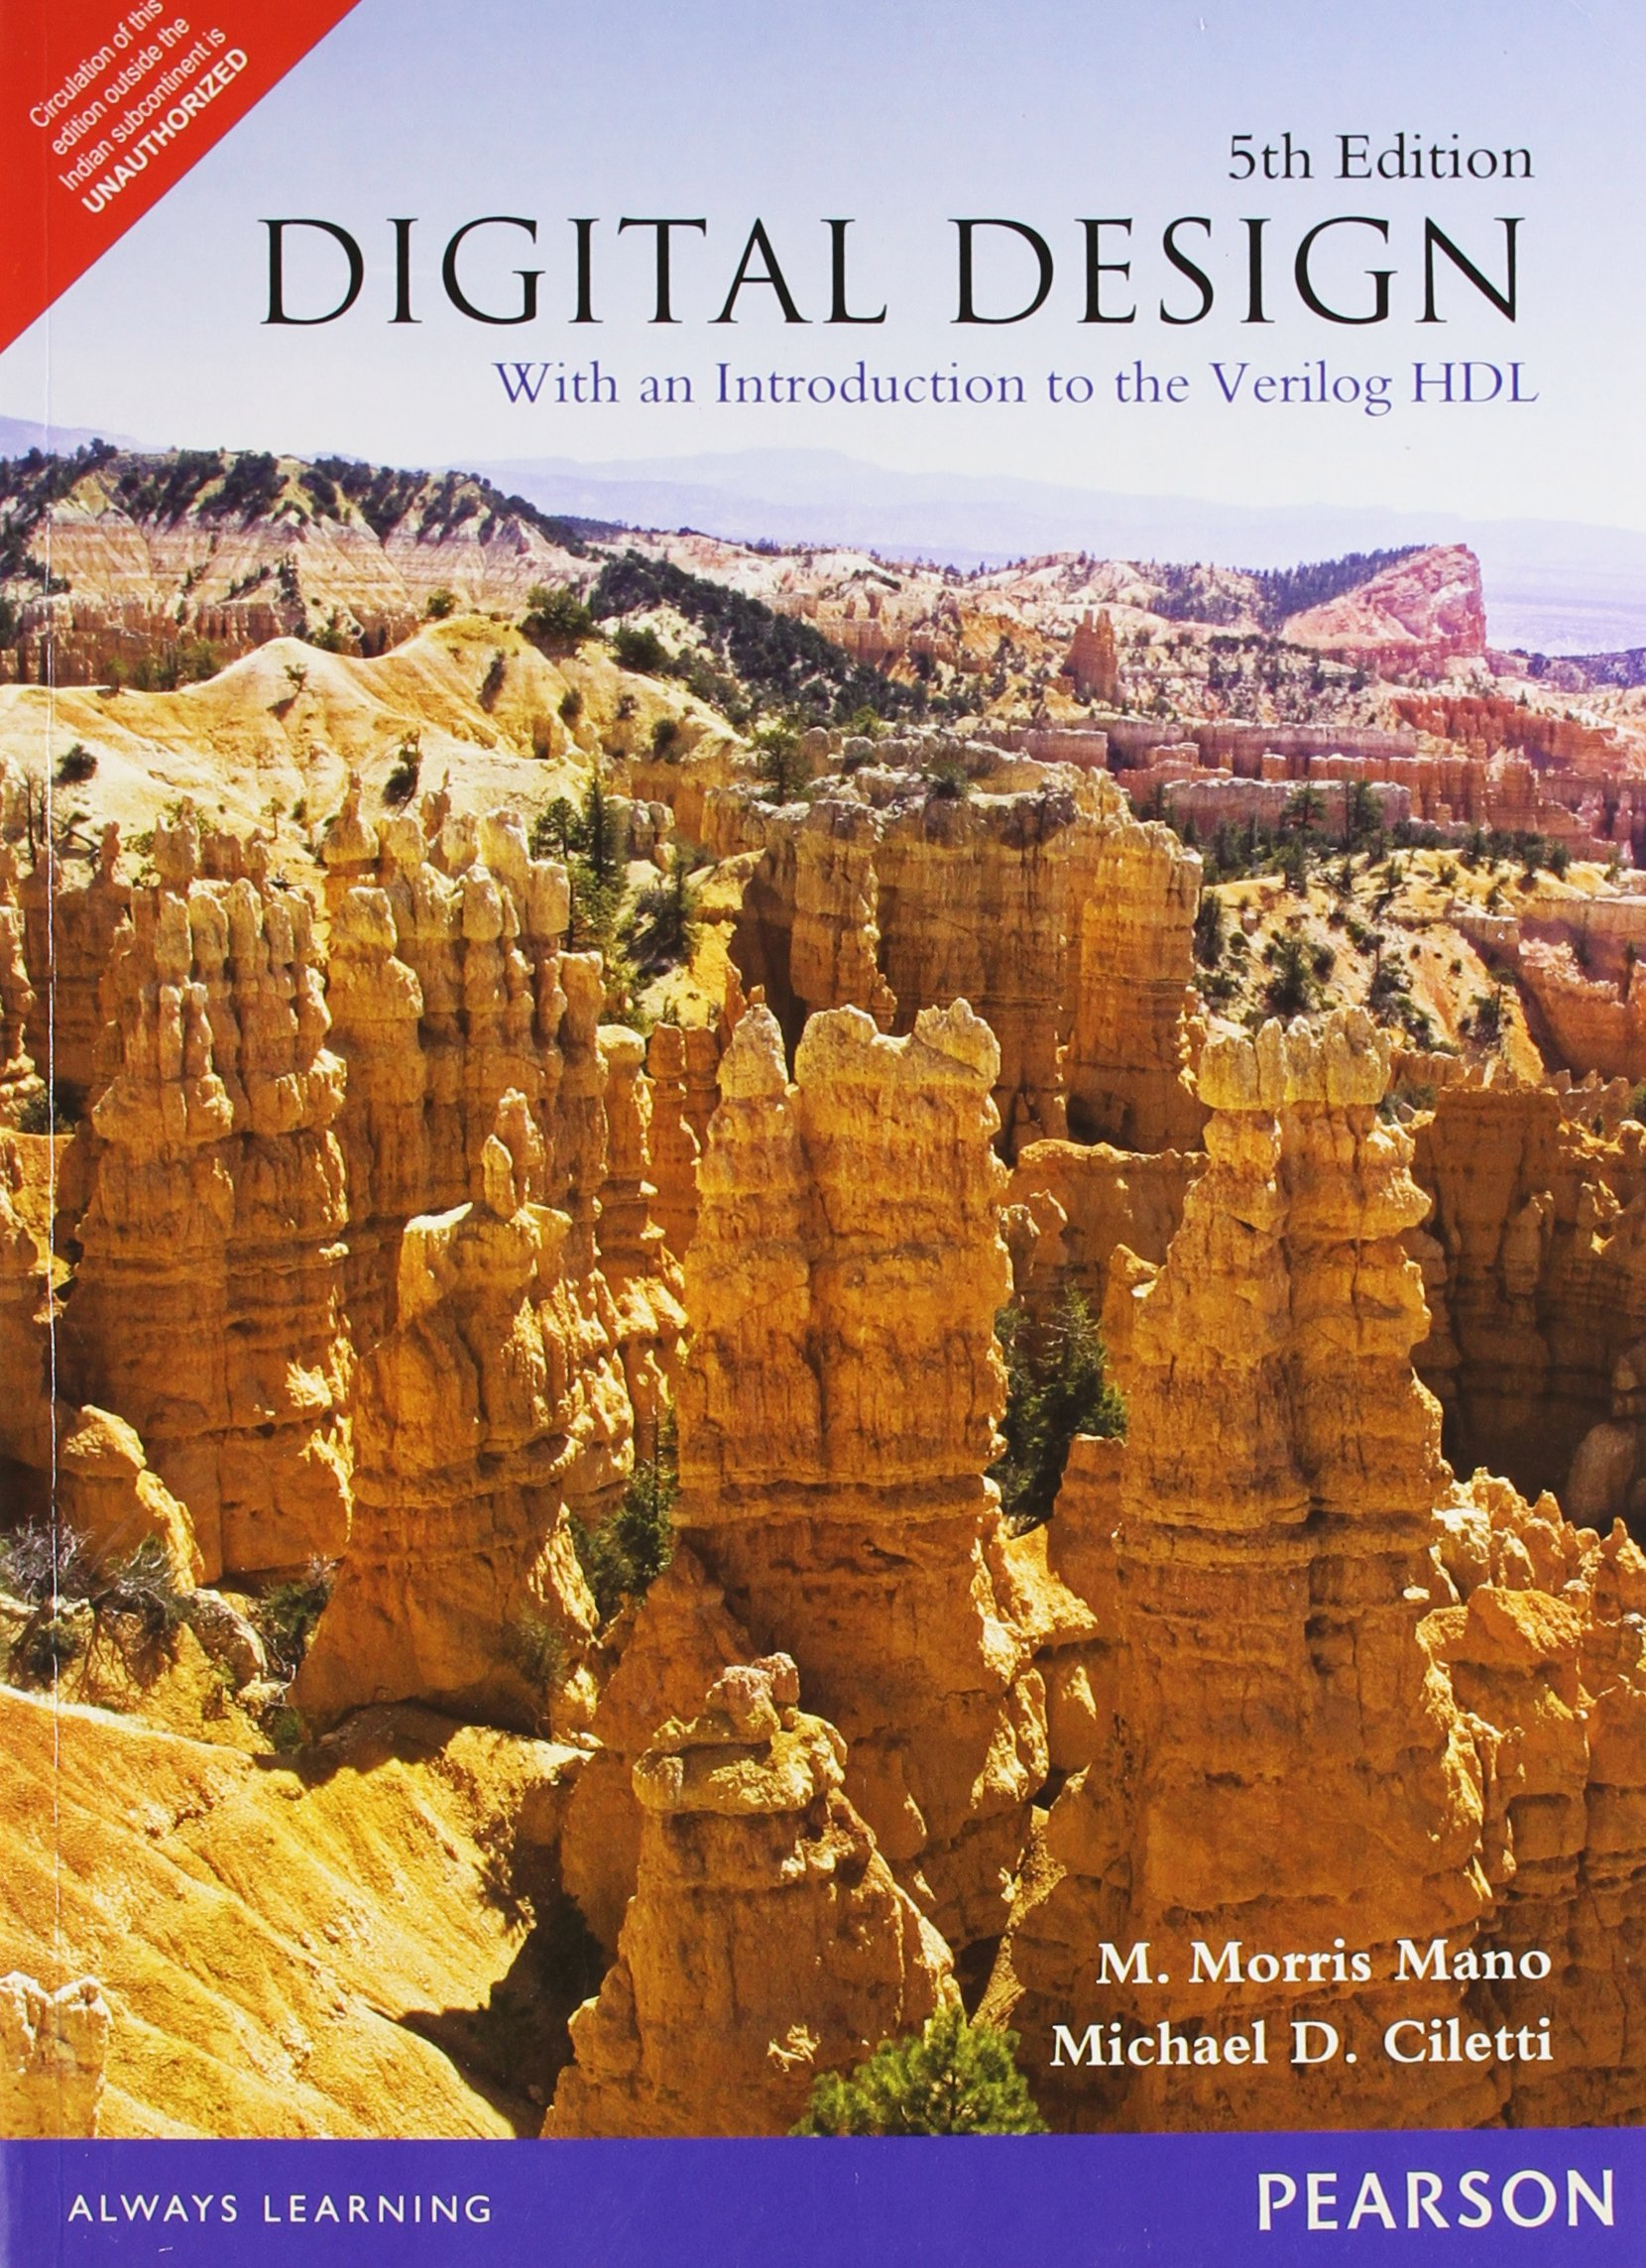 Ebook 9423 Digital Design Morris Mano 4th Edition Solution Manual